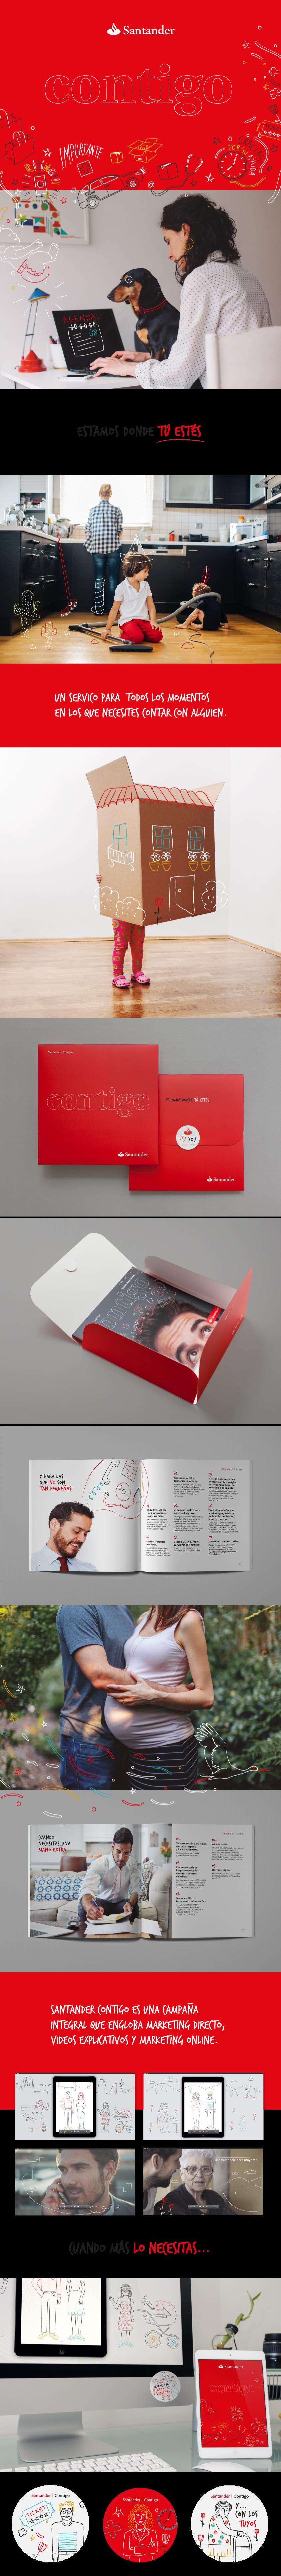 Diseño_CASE_SANTANDER.png